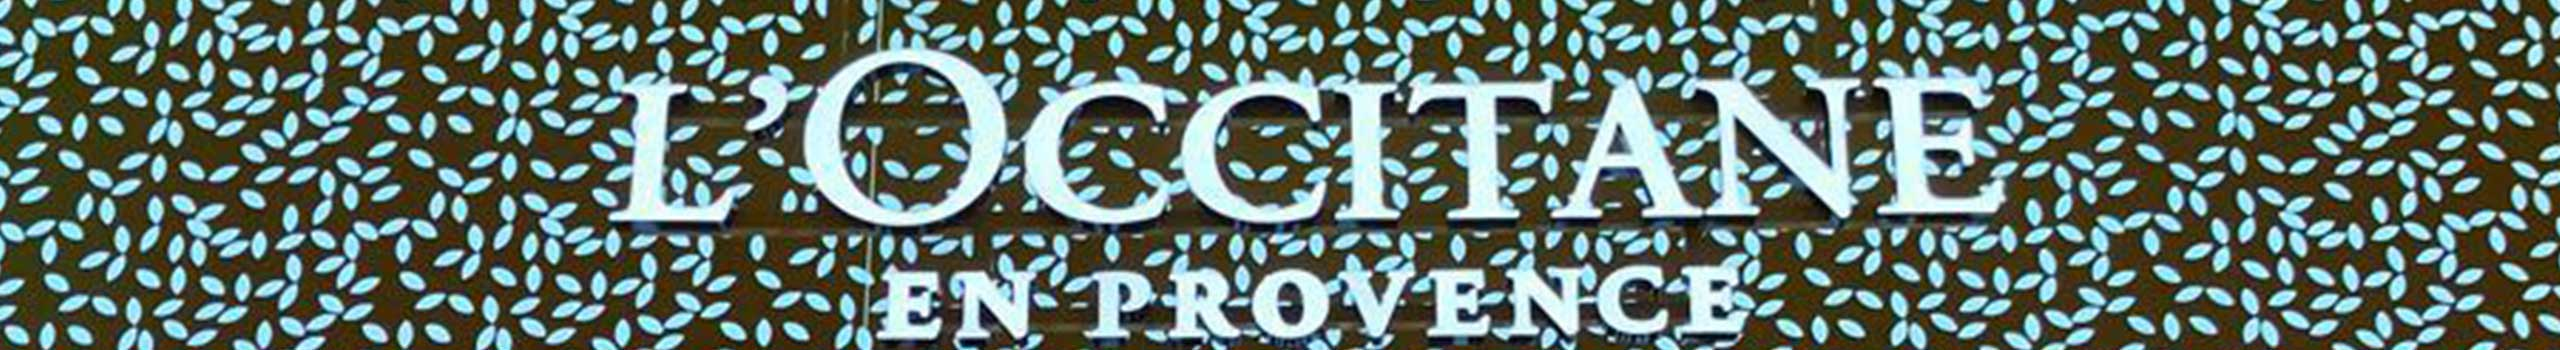 slider-produkte-transparente-02